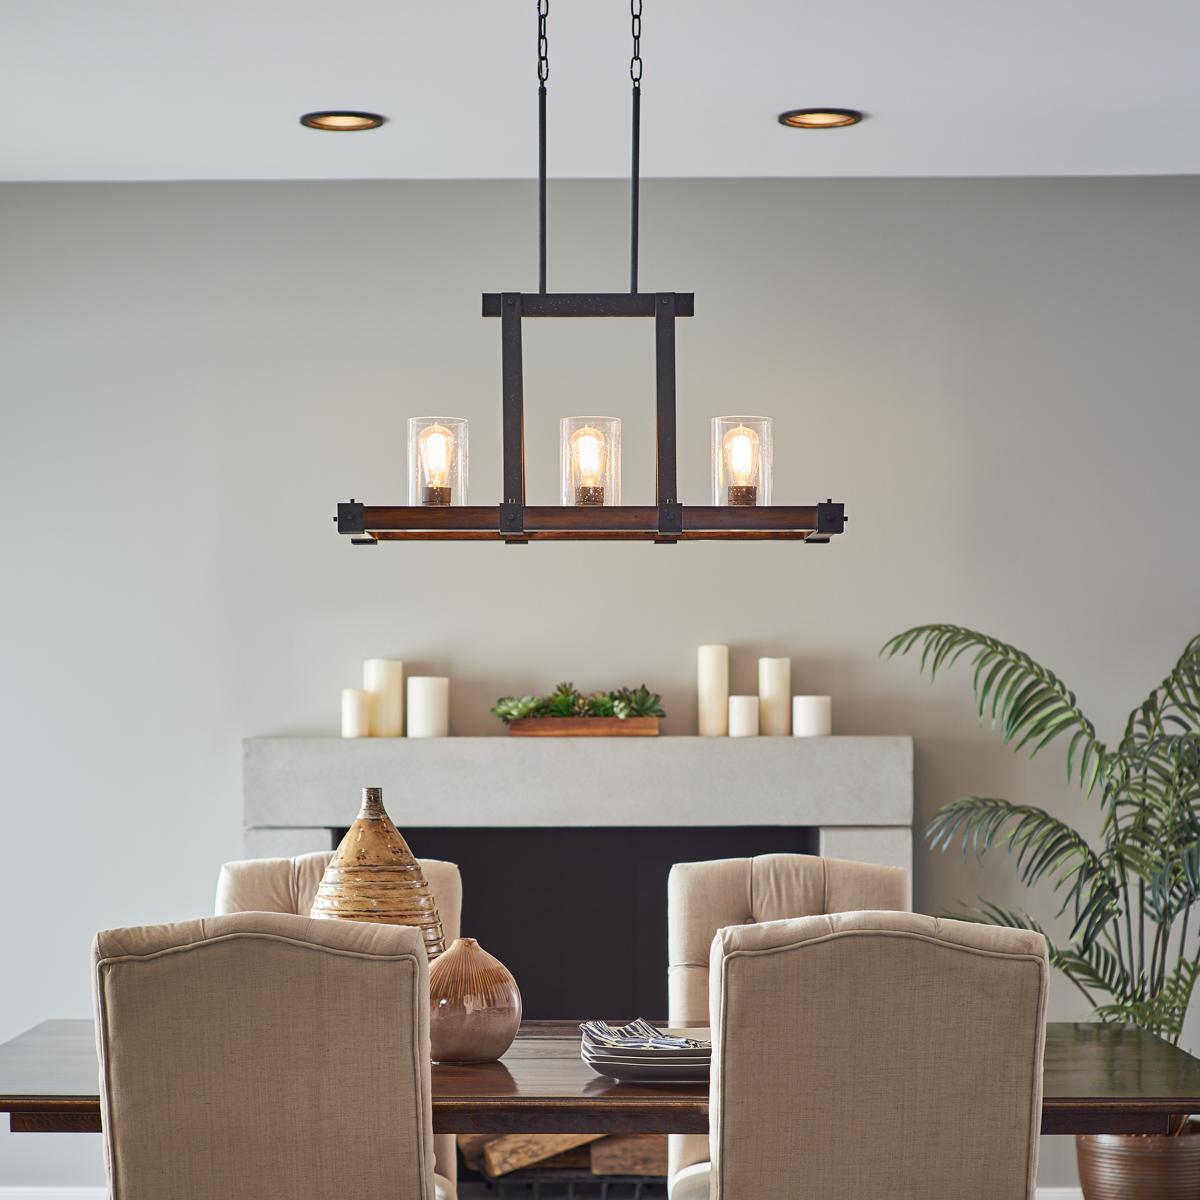 https www kichler com kichler products indoor lighting pendants kitchen island pendants barrington 3 light kitchen island light dbk 5ce65ad1